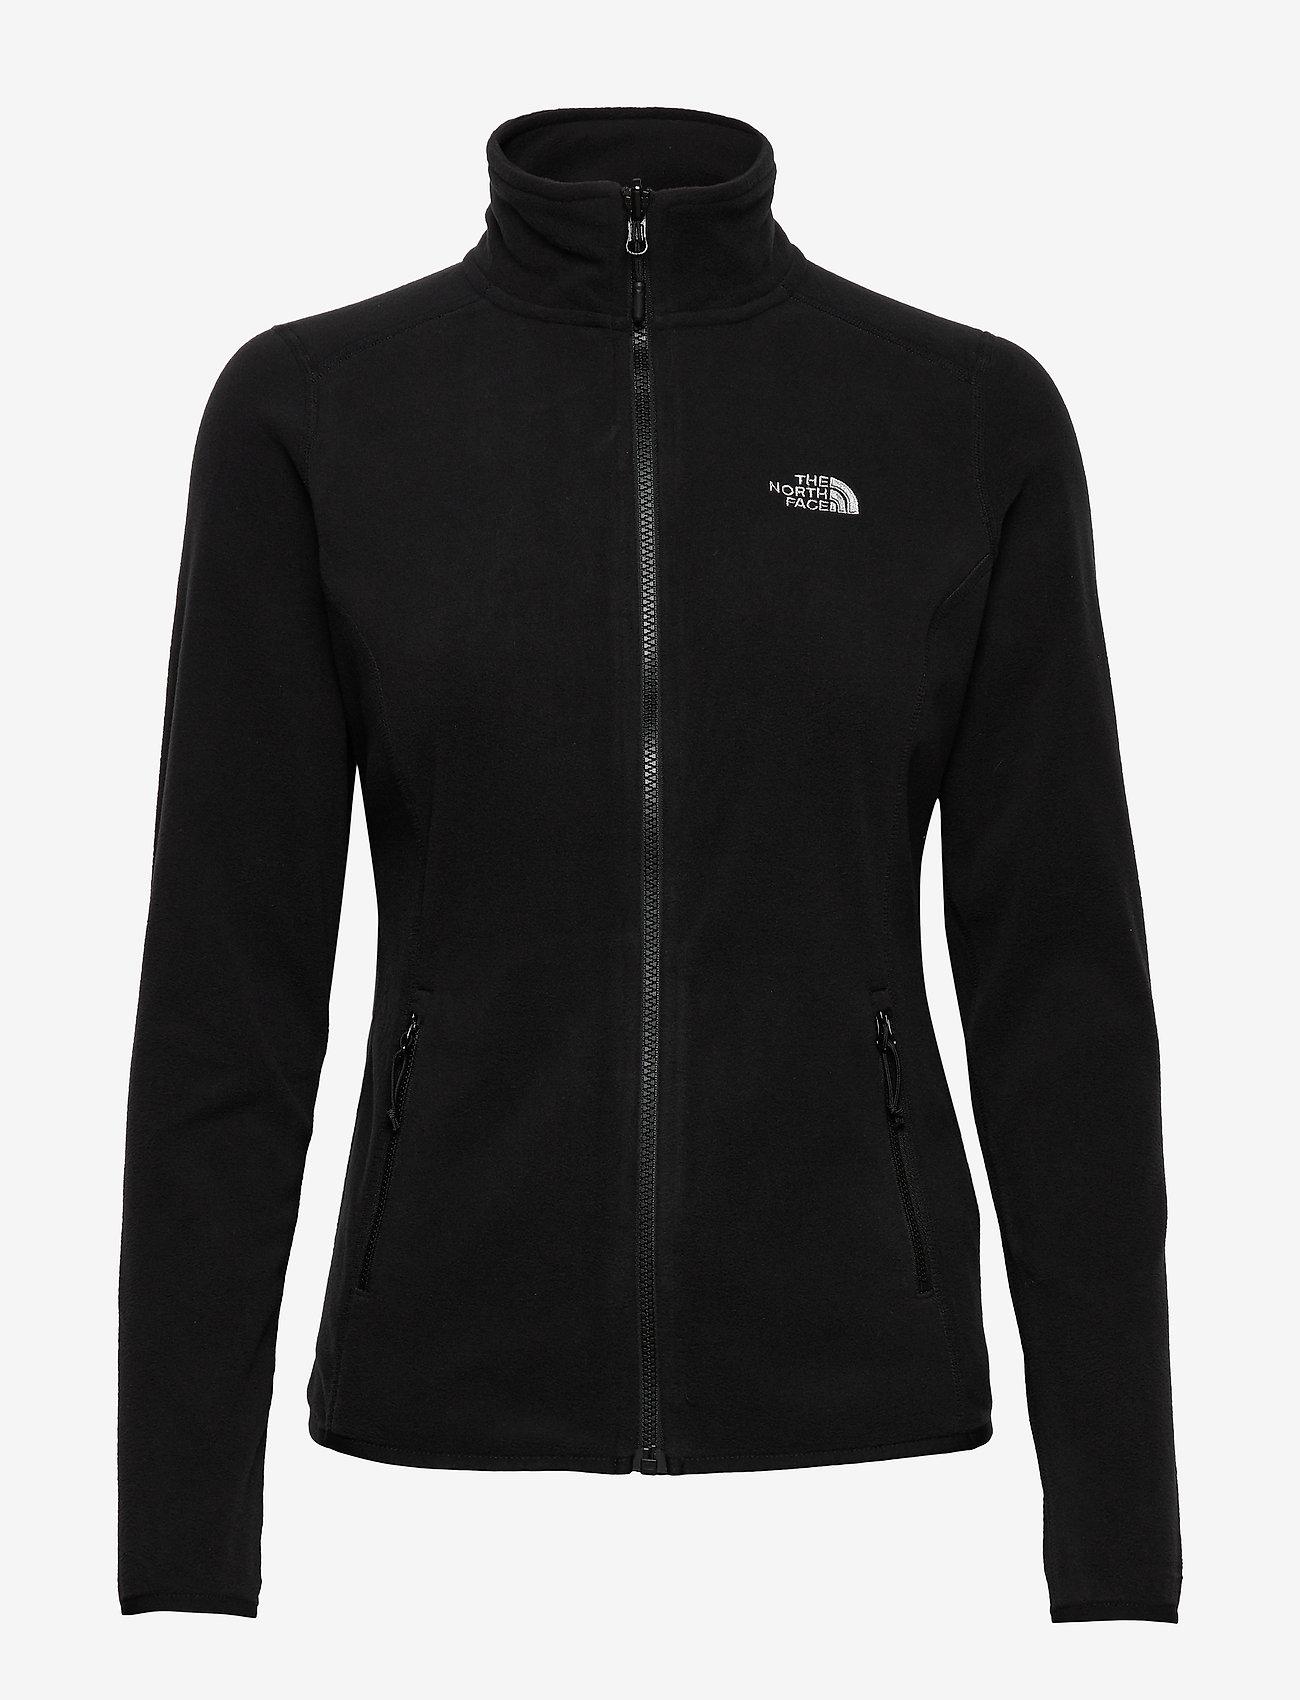 The North Face - W 100 GLACIER FULL ZIP - EU - fleece - tnf black - 0